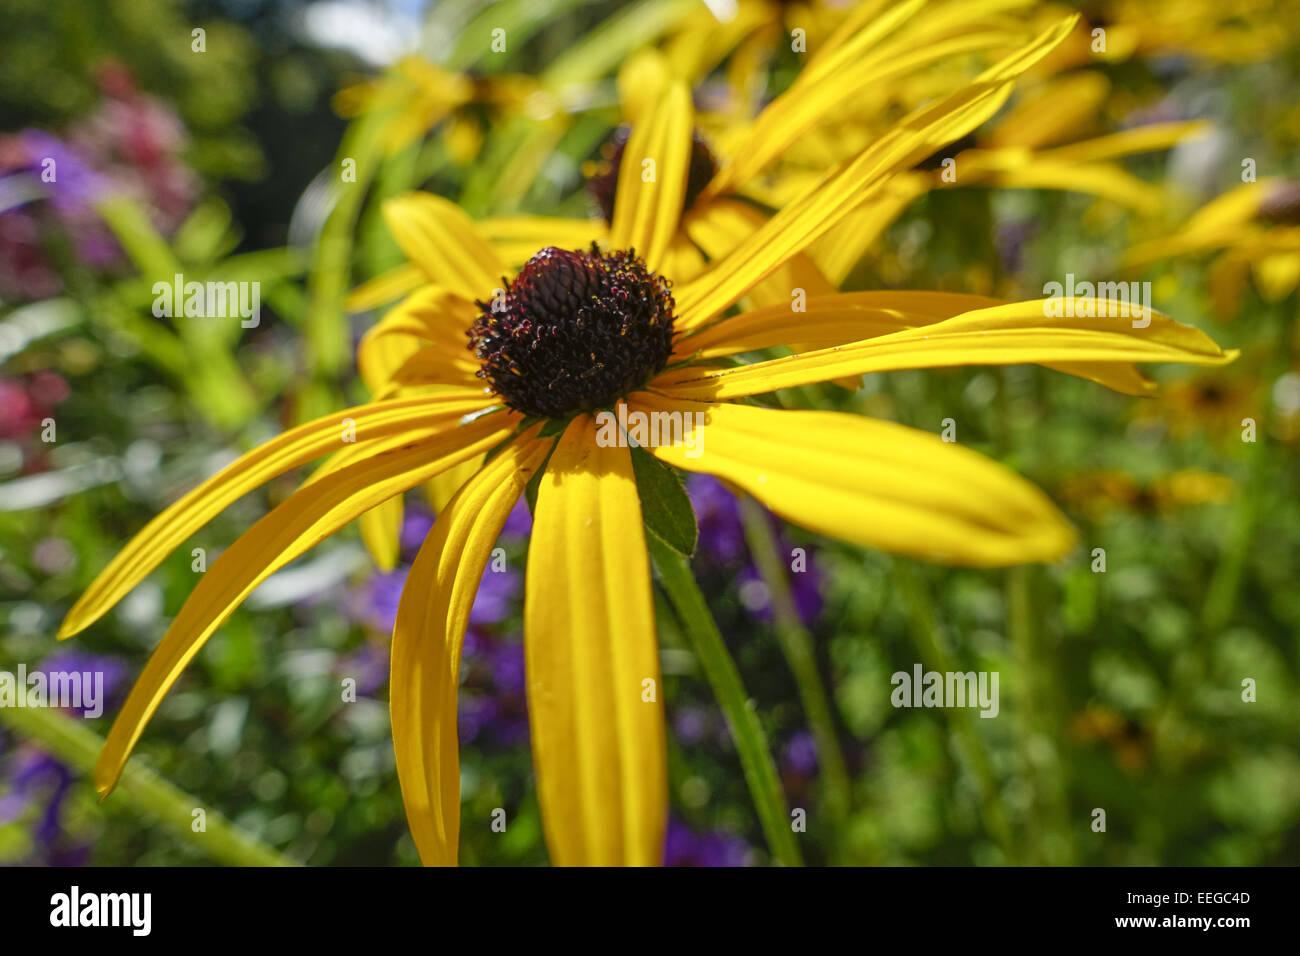 Garten-Sonnenhut (Rudbeckia fulgida var deamii), Goldsturm flower (Rudbeckia fulgida var deamii), asteraceae, background, - Stock Image